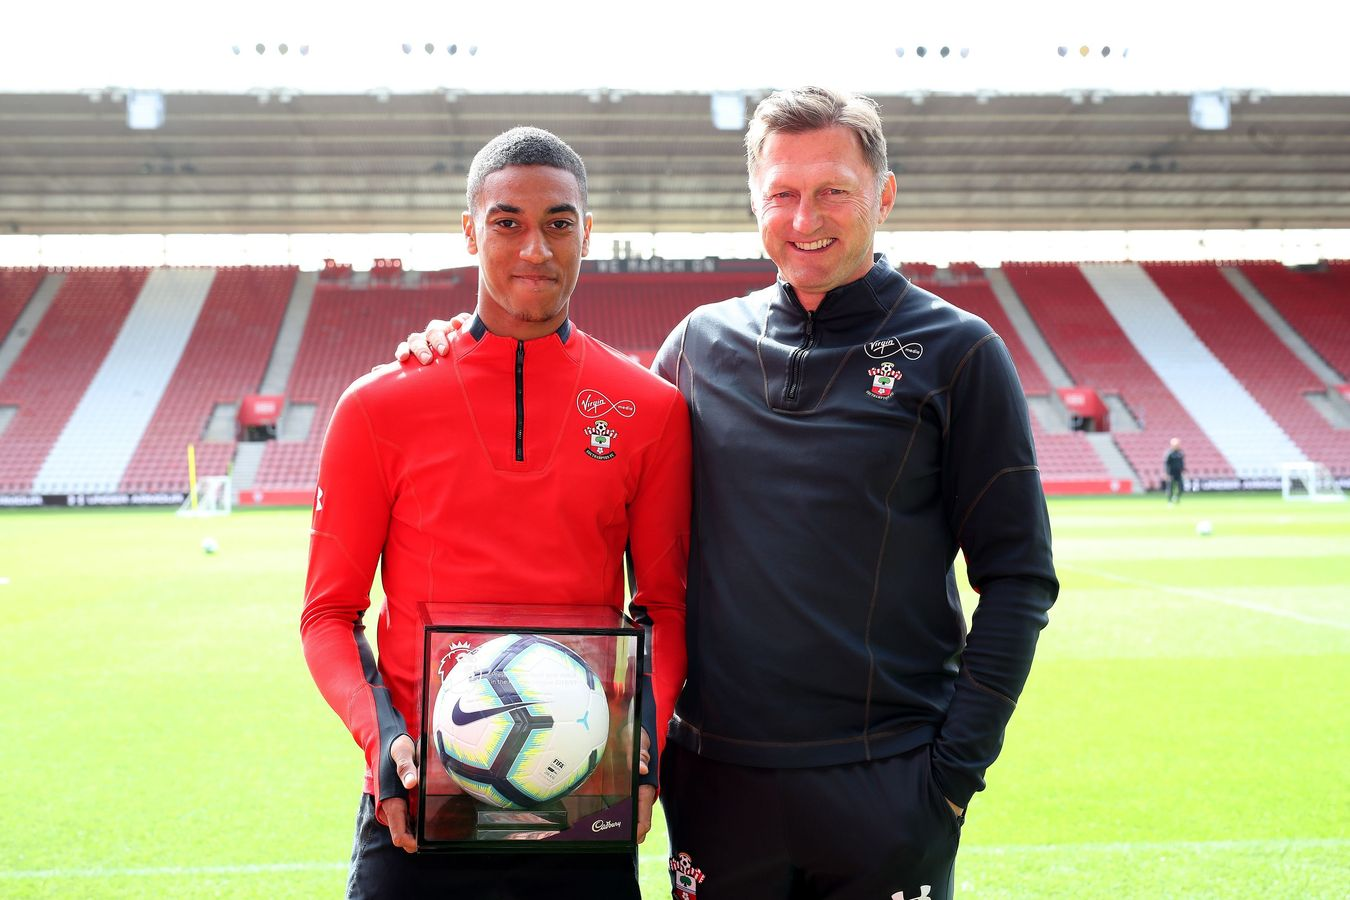 Southampton's Yan Valery and Ralph Hasenhuttl